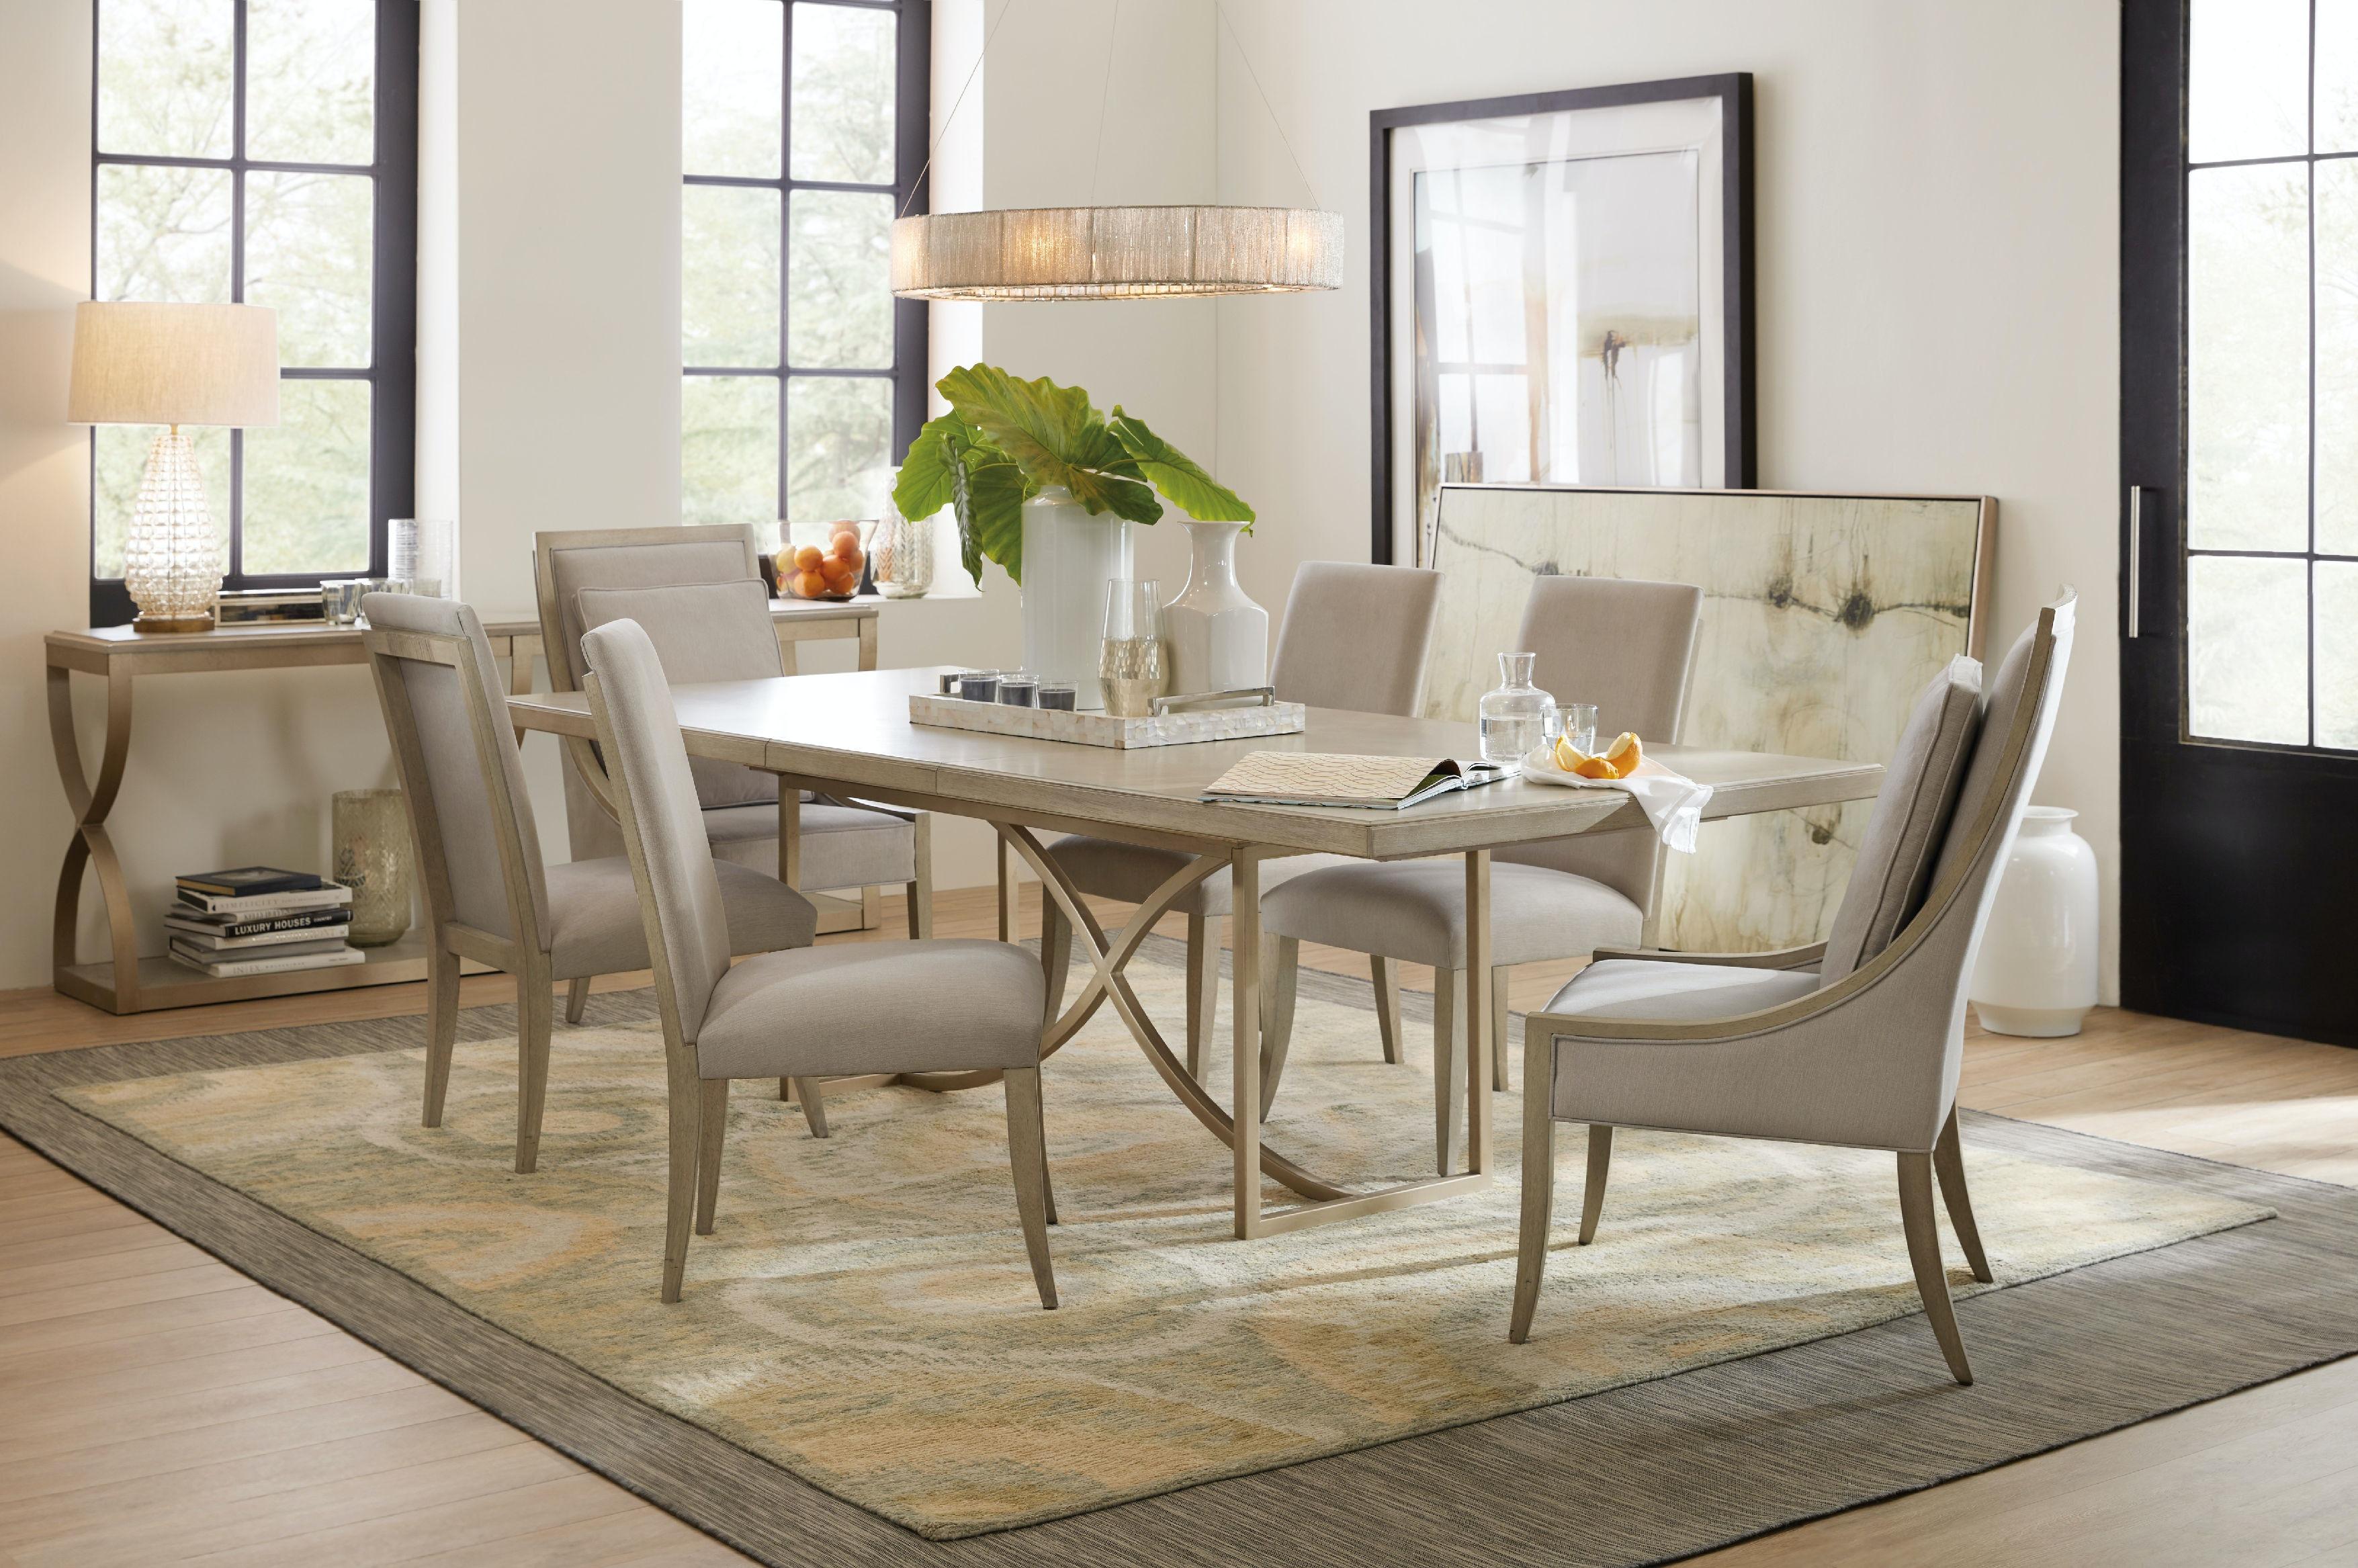 Hooker Furniture Dining Room Elixir Host Chair 5990-75500-LTWD